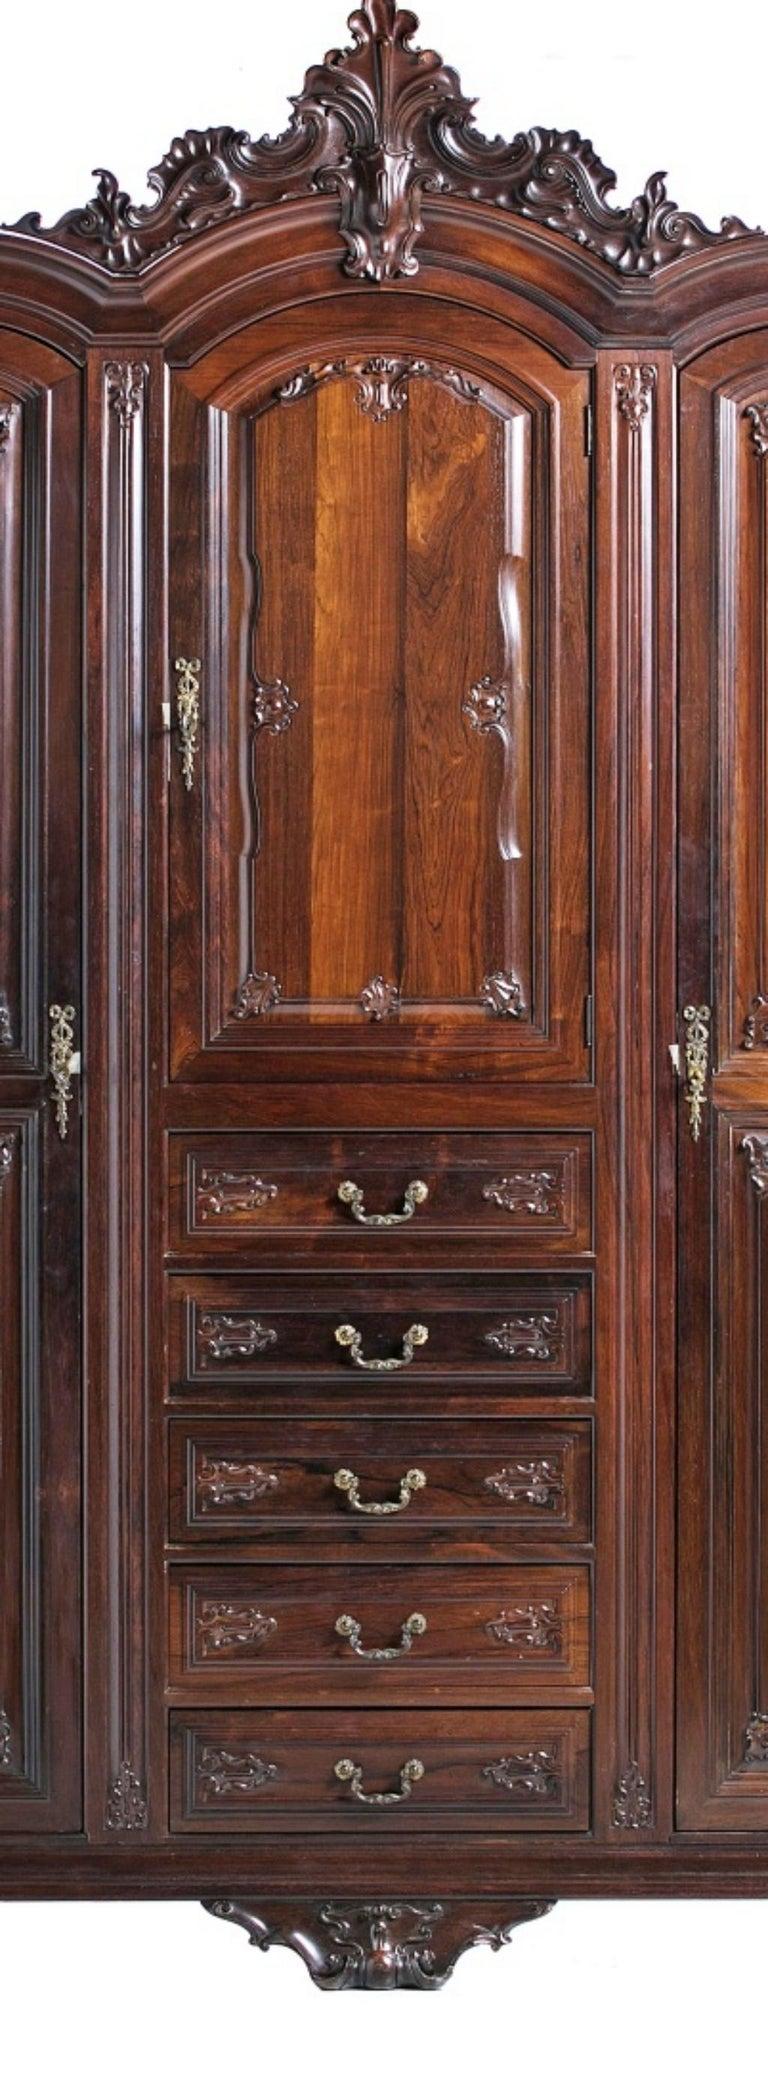 Victorian Important Brazilian Wardrobe Closet in Palisander Wood, 20th Century For Sale